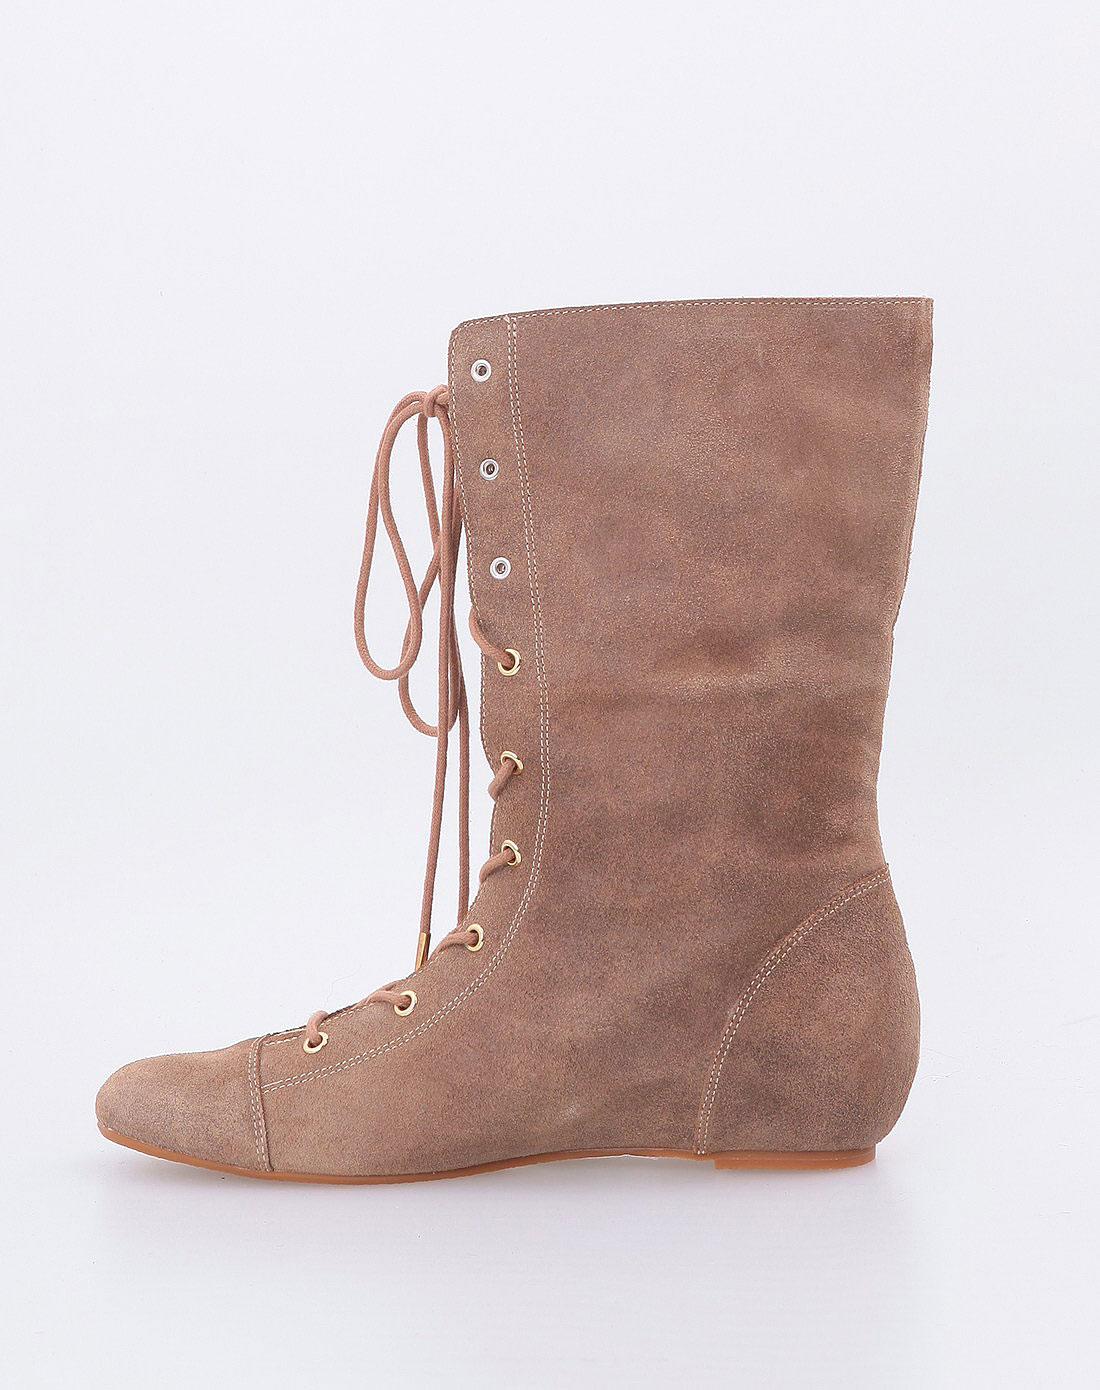 sofi卡其色时尚牛皮短靴nf0wbf0323-020